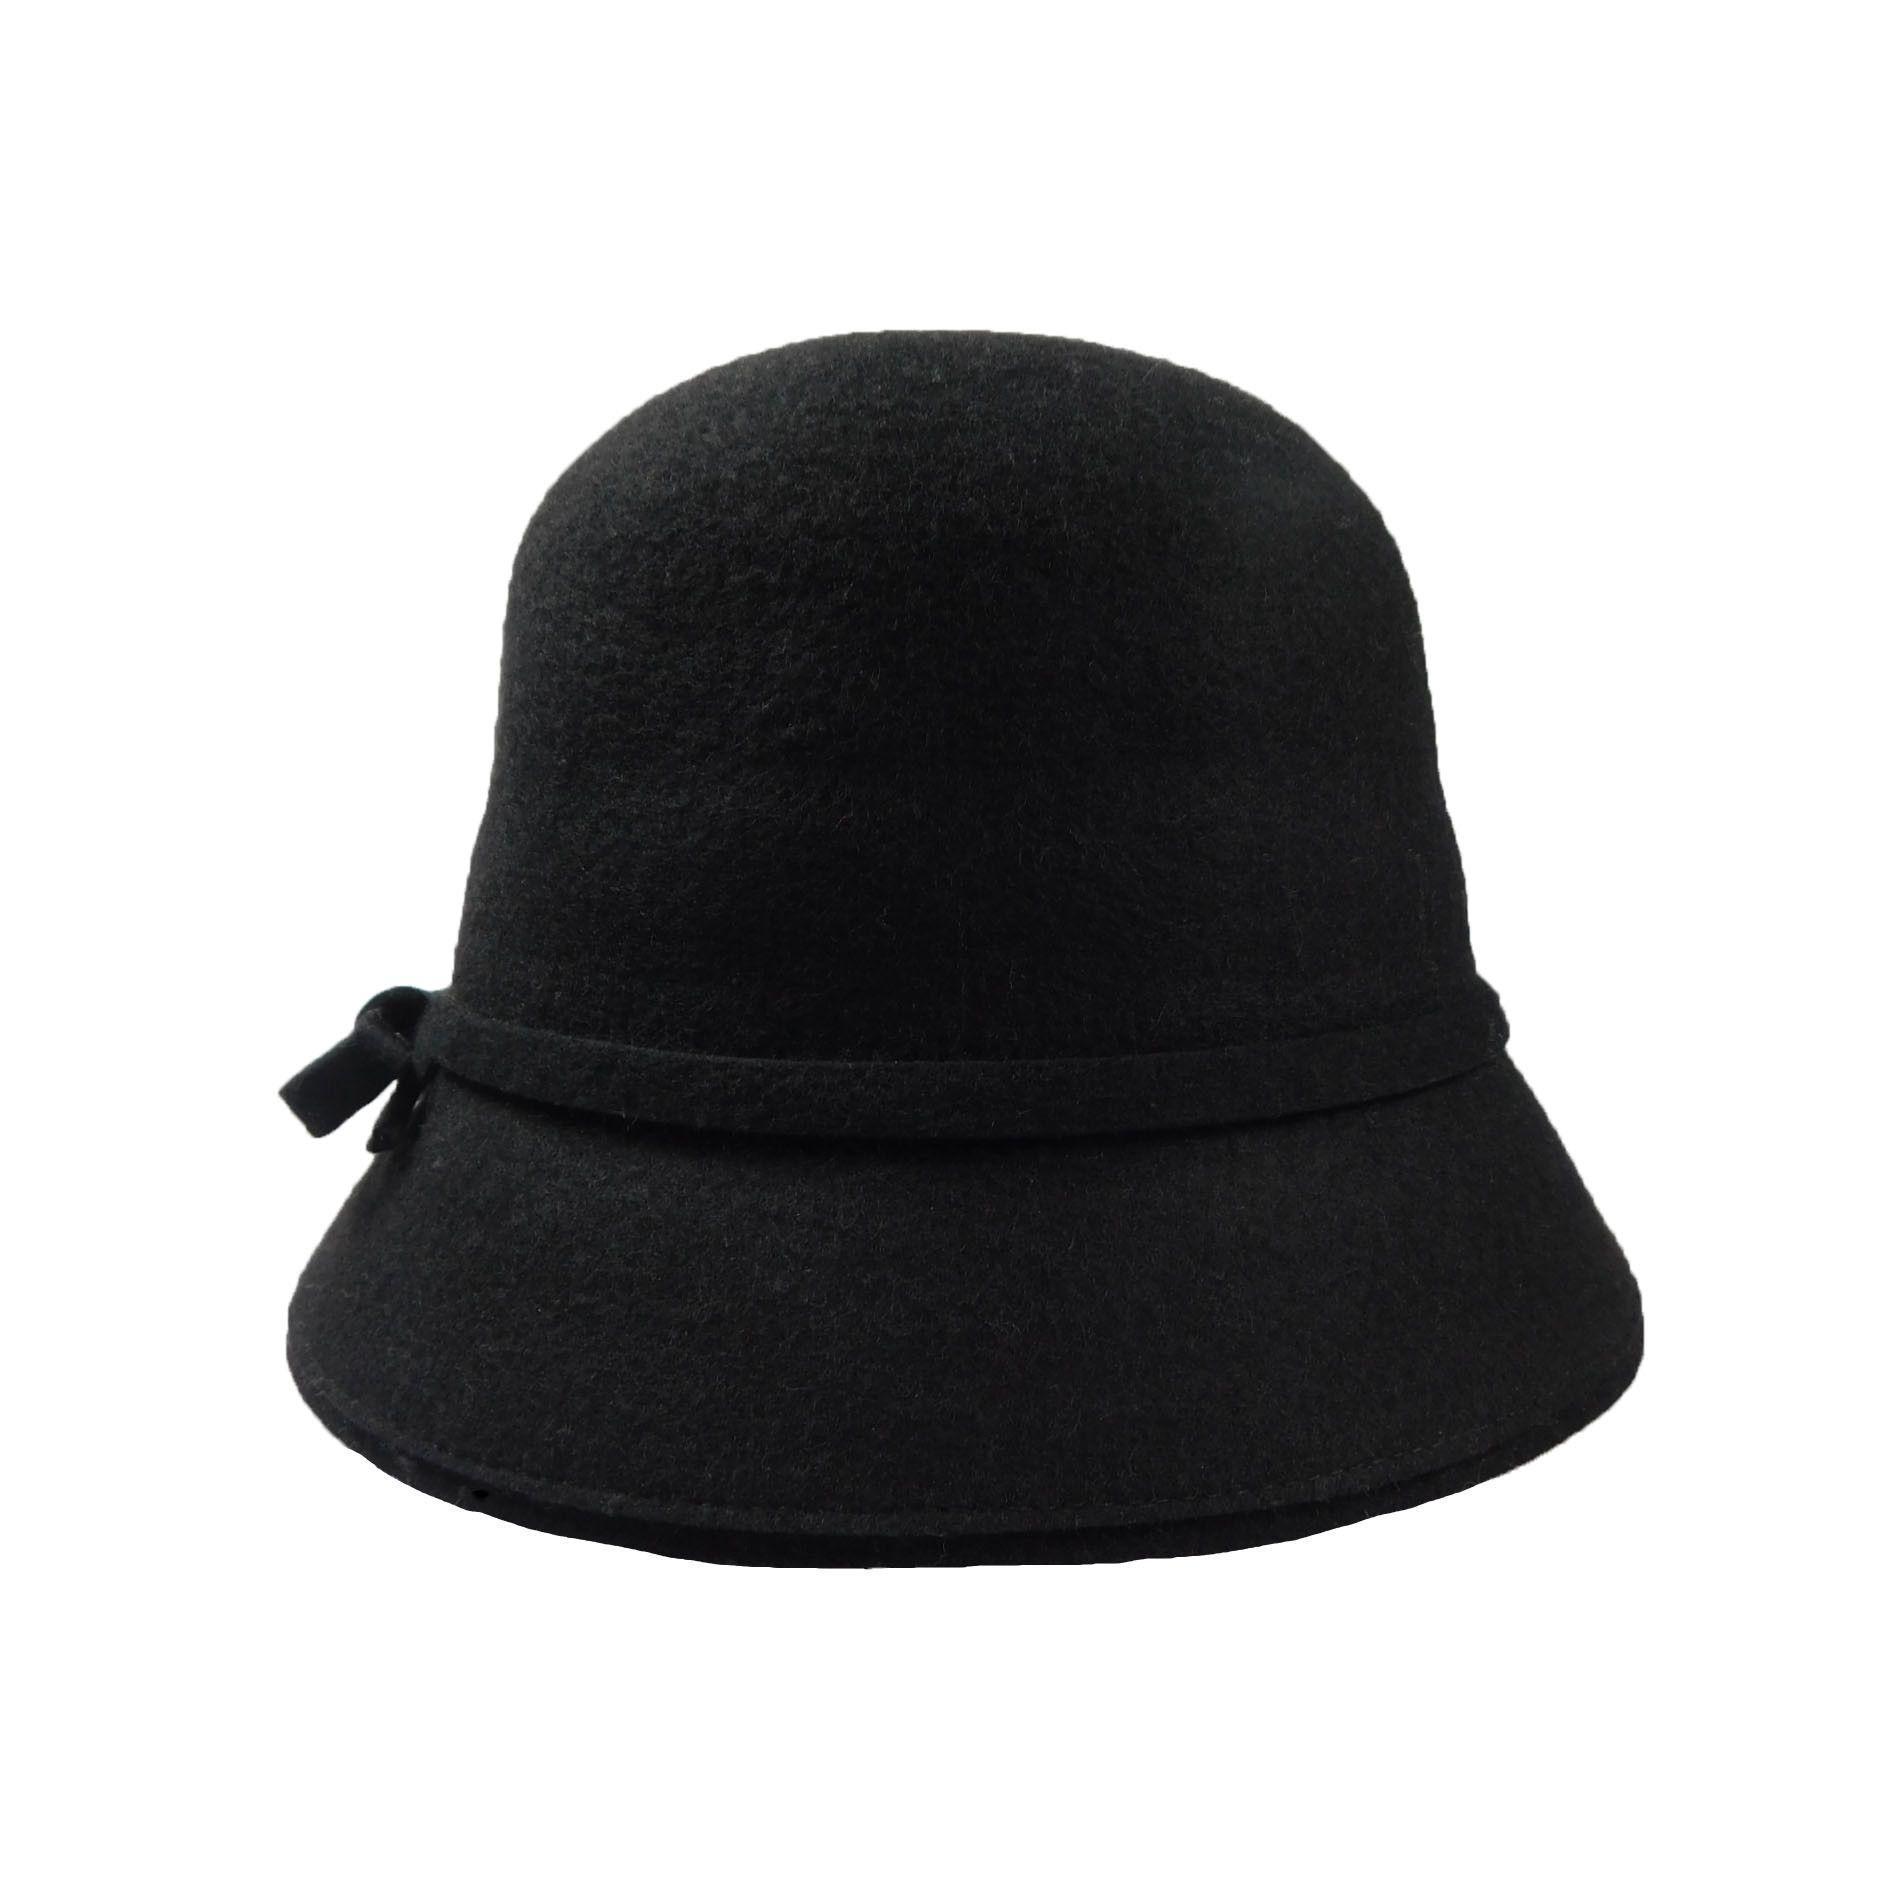 108d4bba200 Simply elegant wool felt bell shape hat. Black felt band with bow and trim.  2